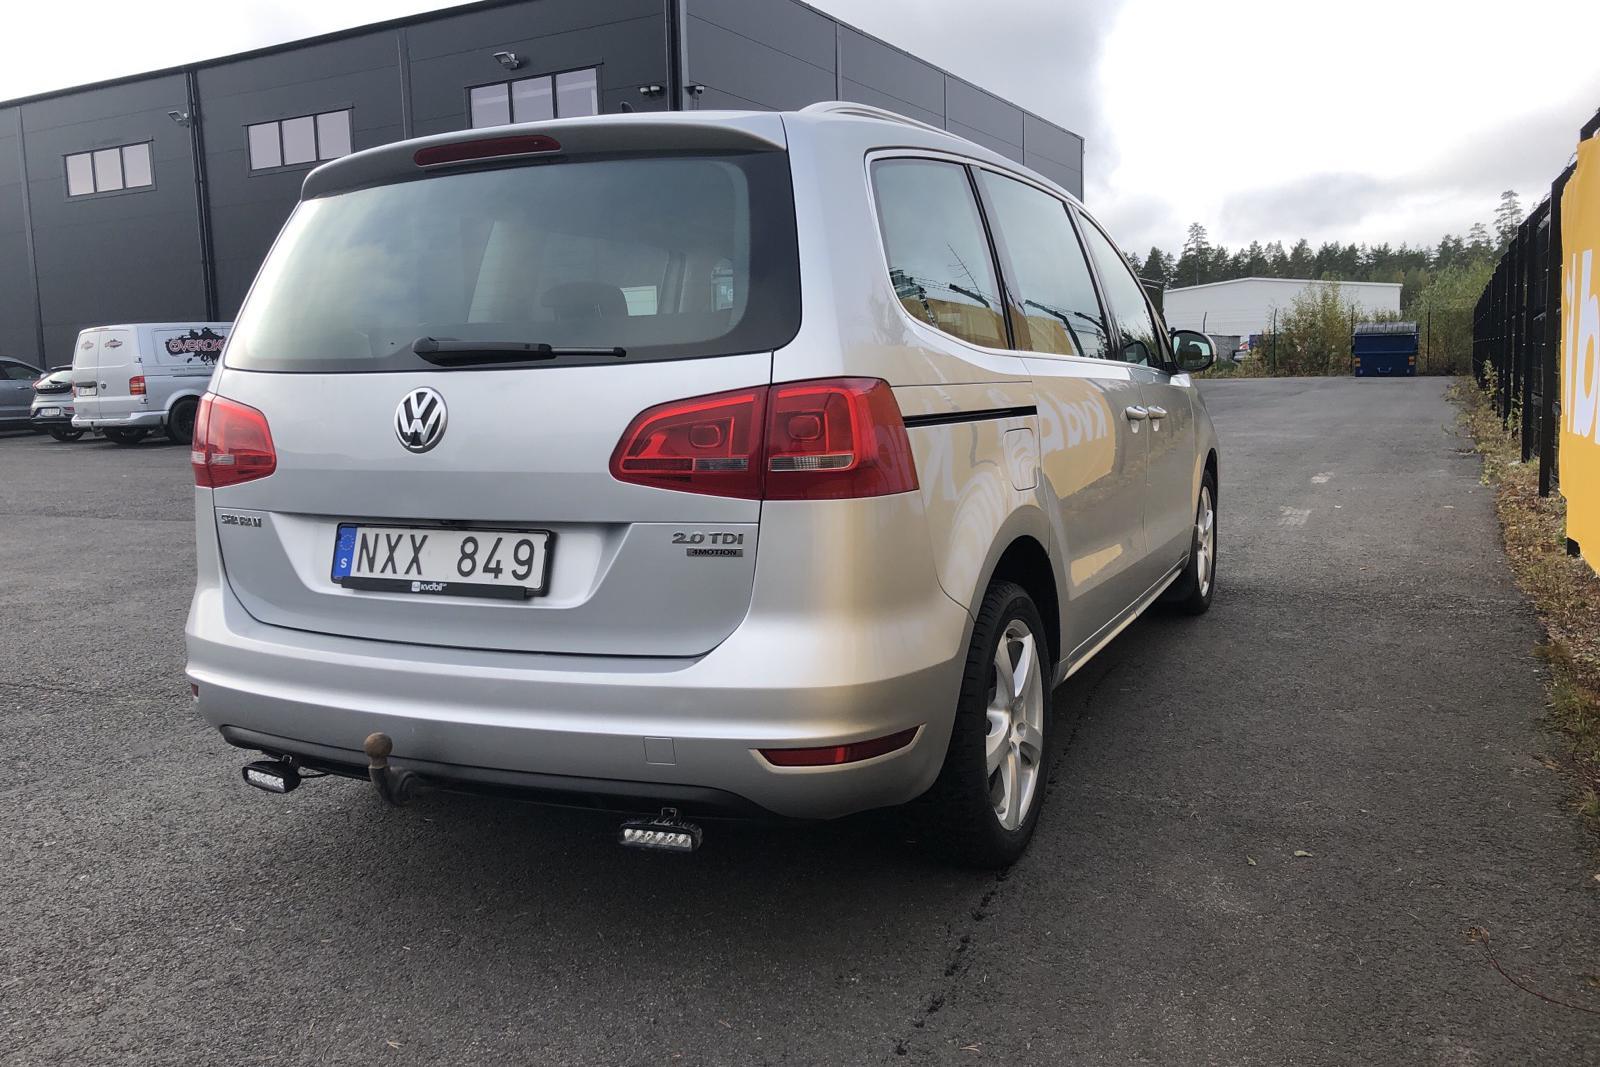 VW Sharan 2.0 TDI BlueMotion Technology 4motion (140hk) - 223 970 km - Manual - silver - 2014